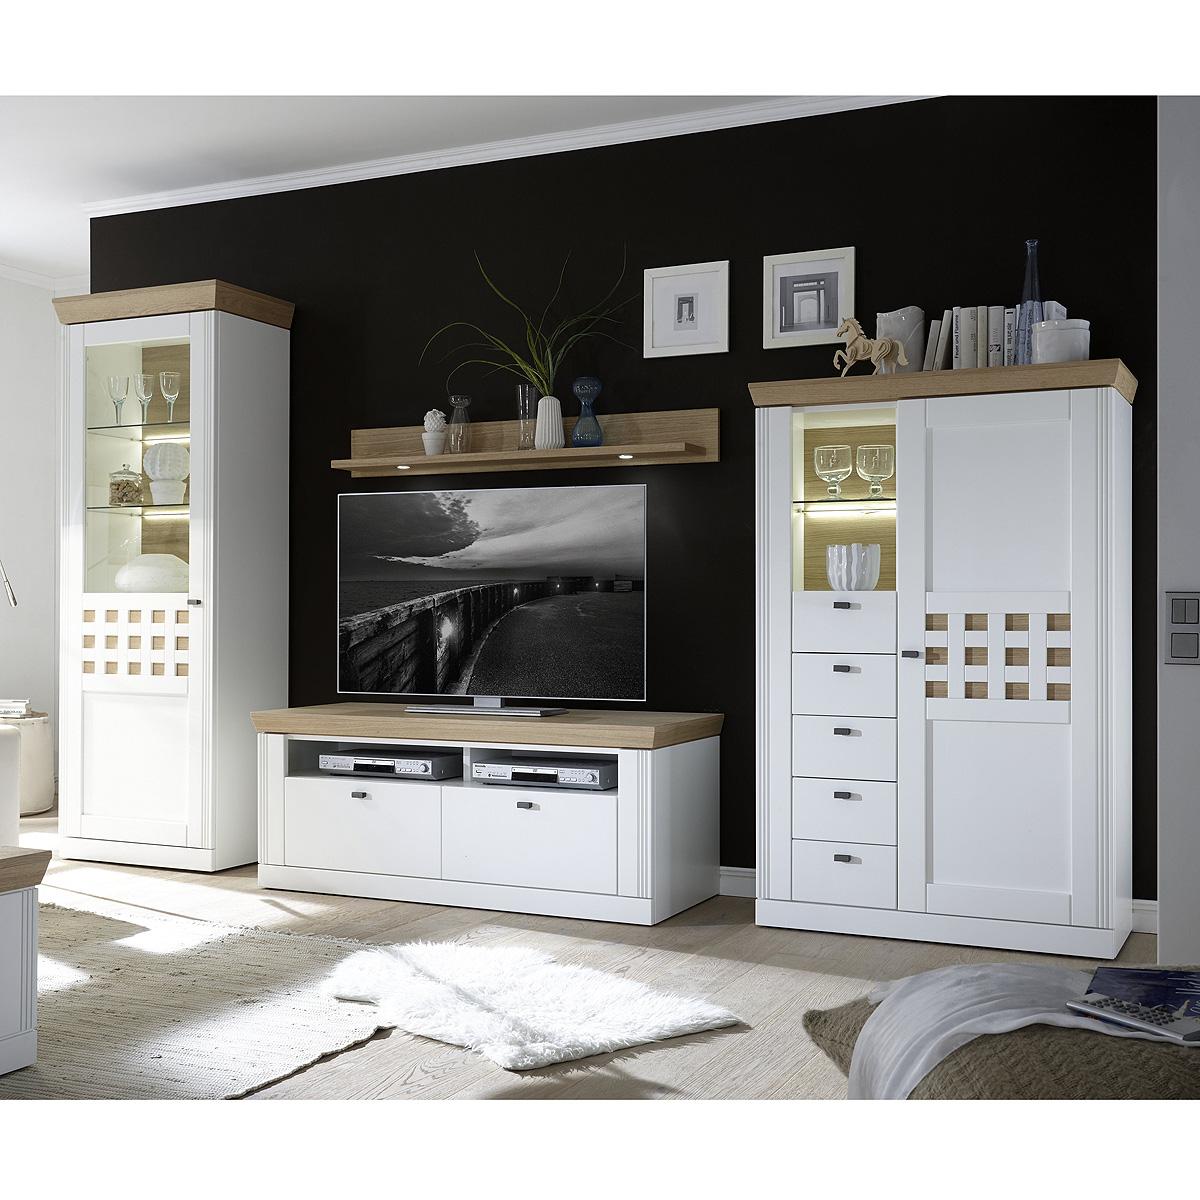 wohnwand boleros anbauwand wohnkombi wohnzimmer wei lack. Black Bedroom Furniture Sets. Home Design Ideas